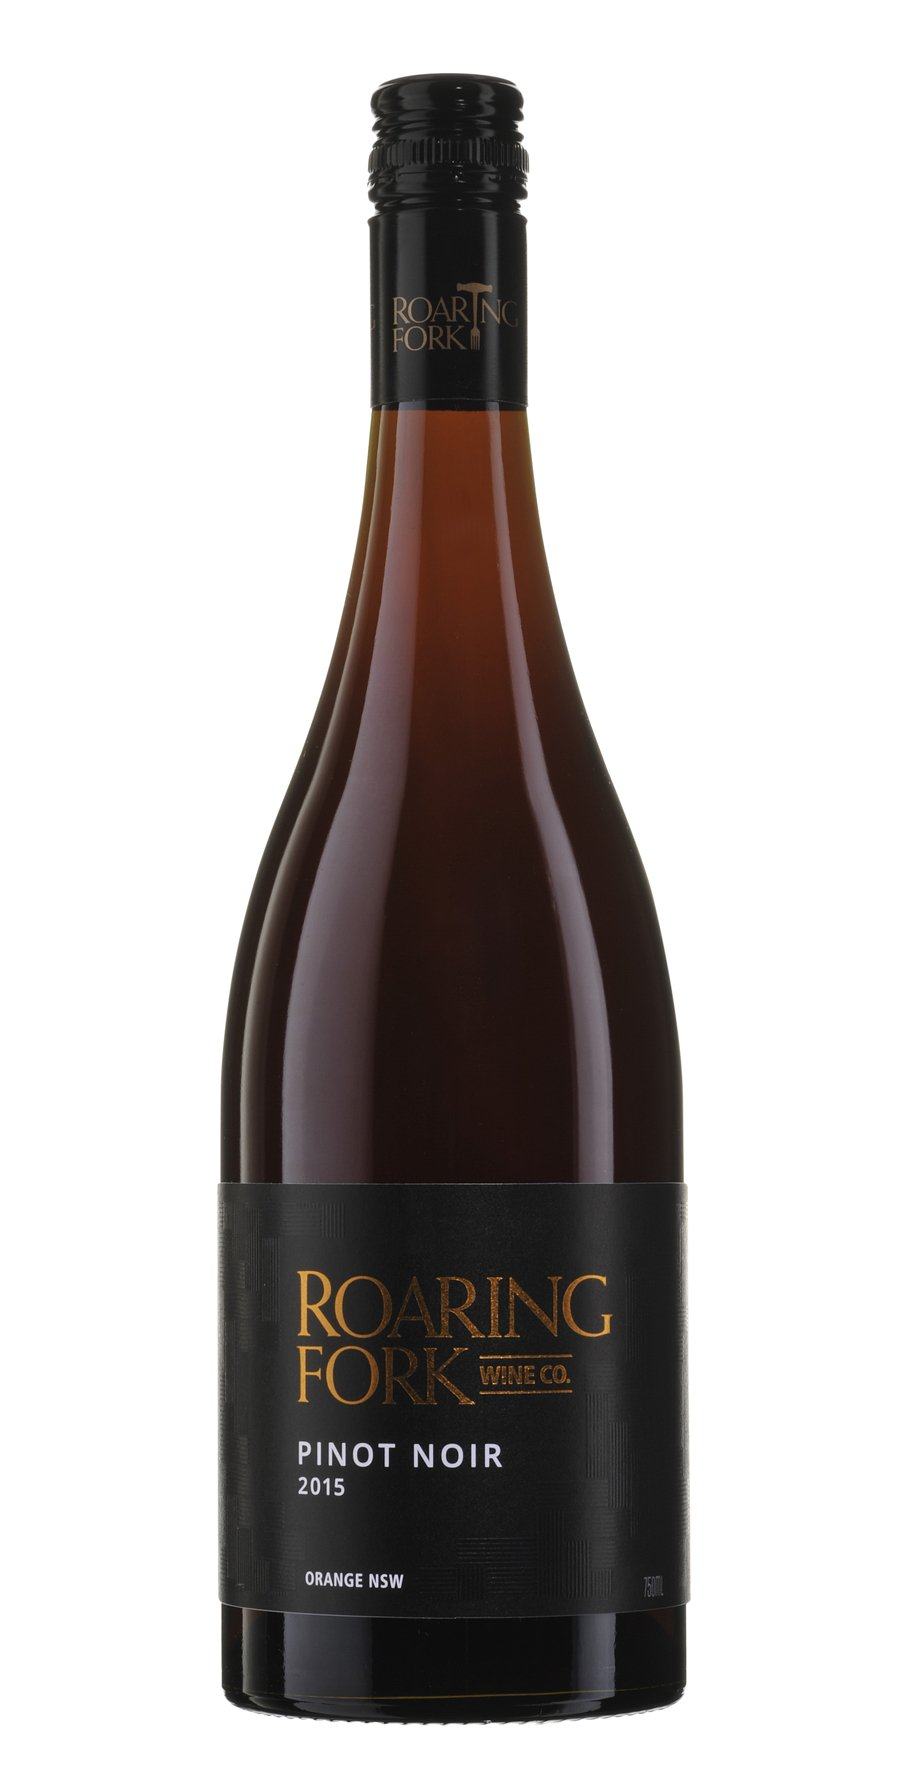 Roaring Fork 2016 Pinot Noir